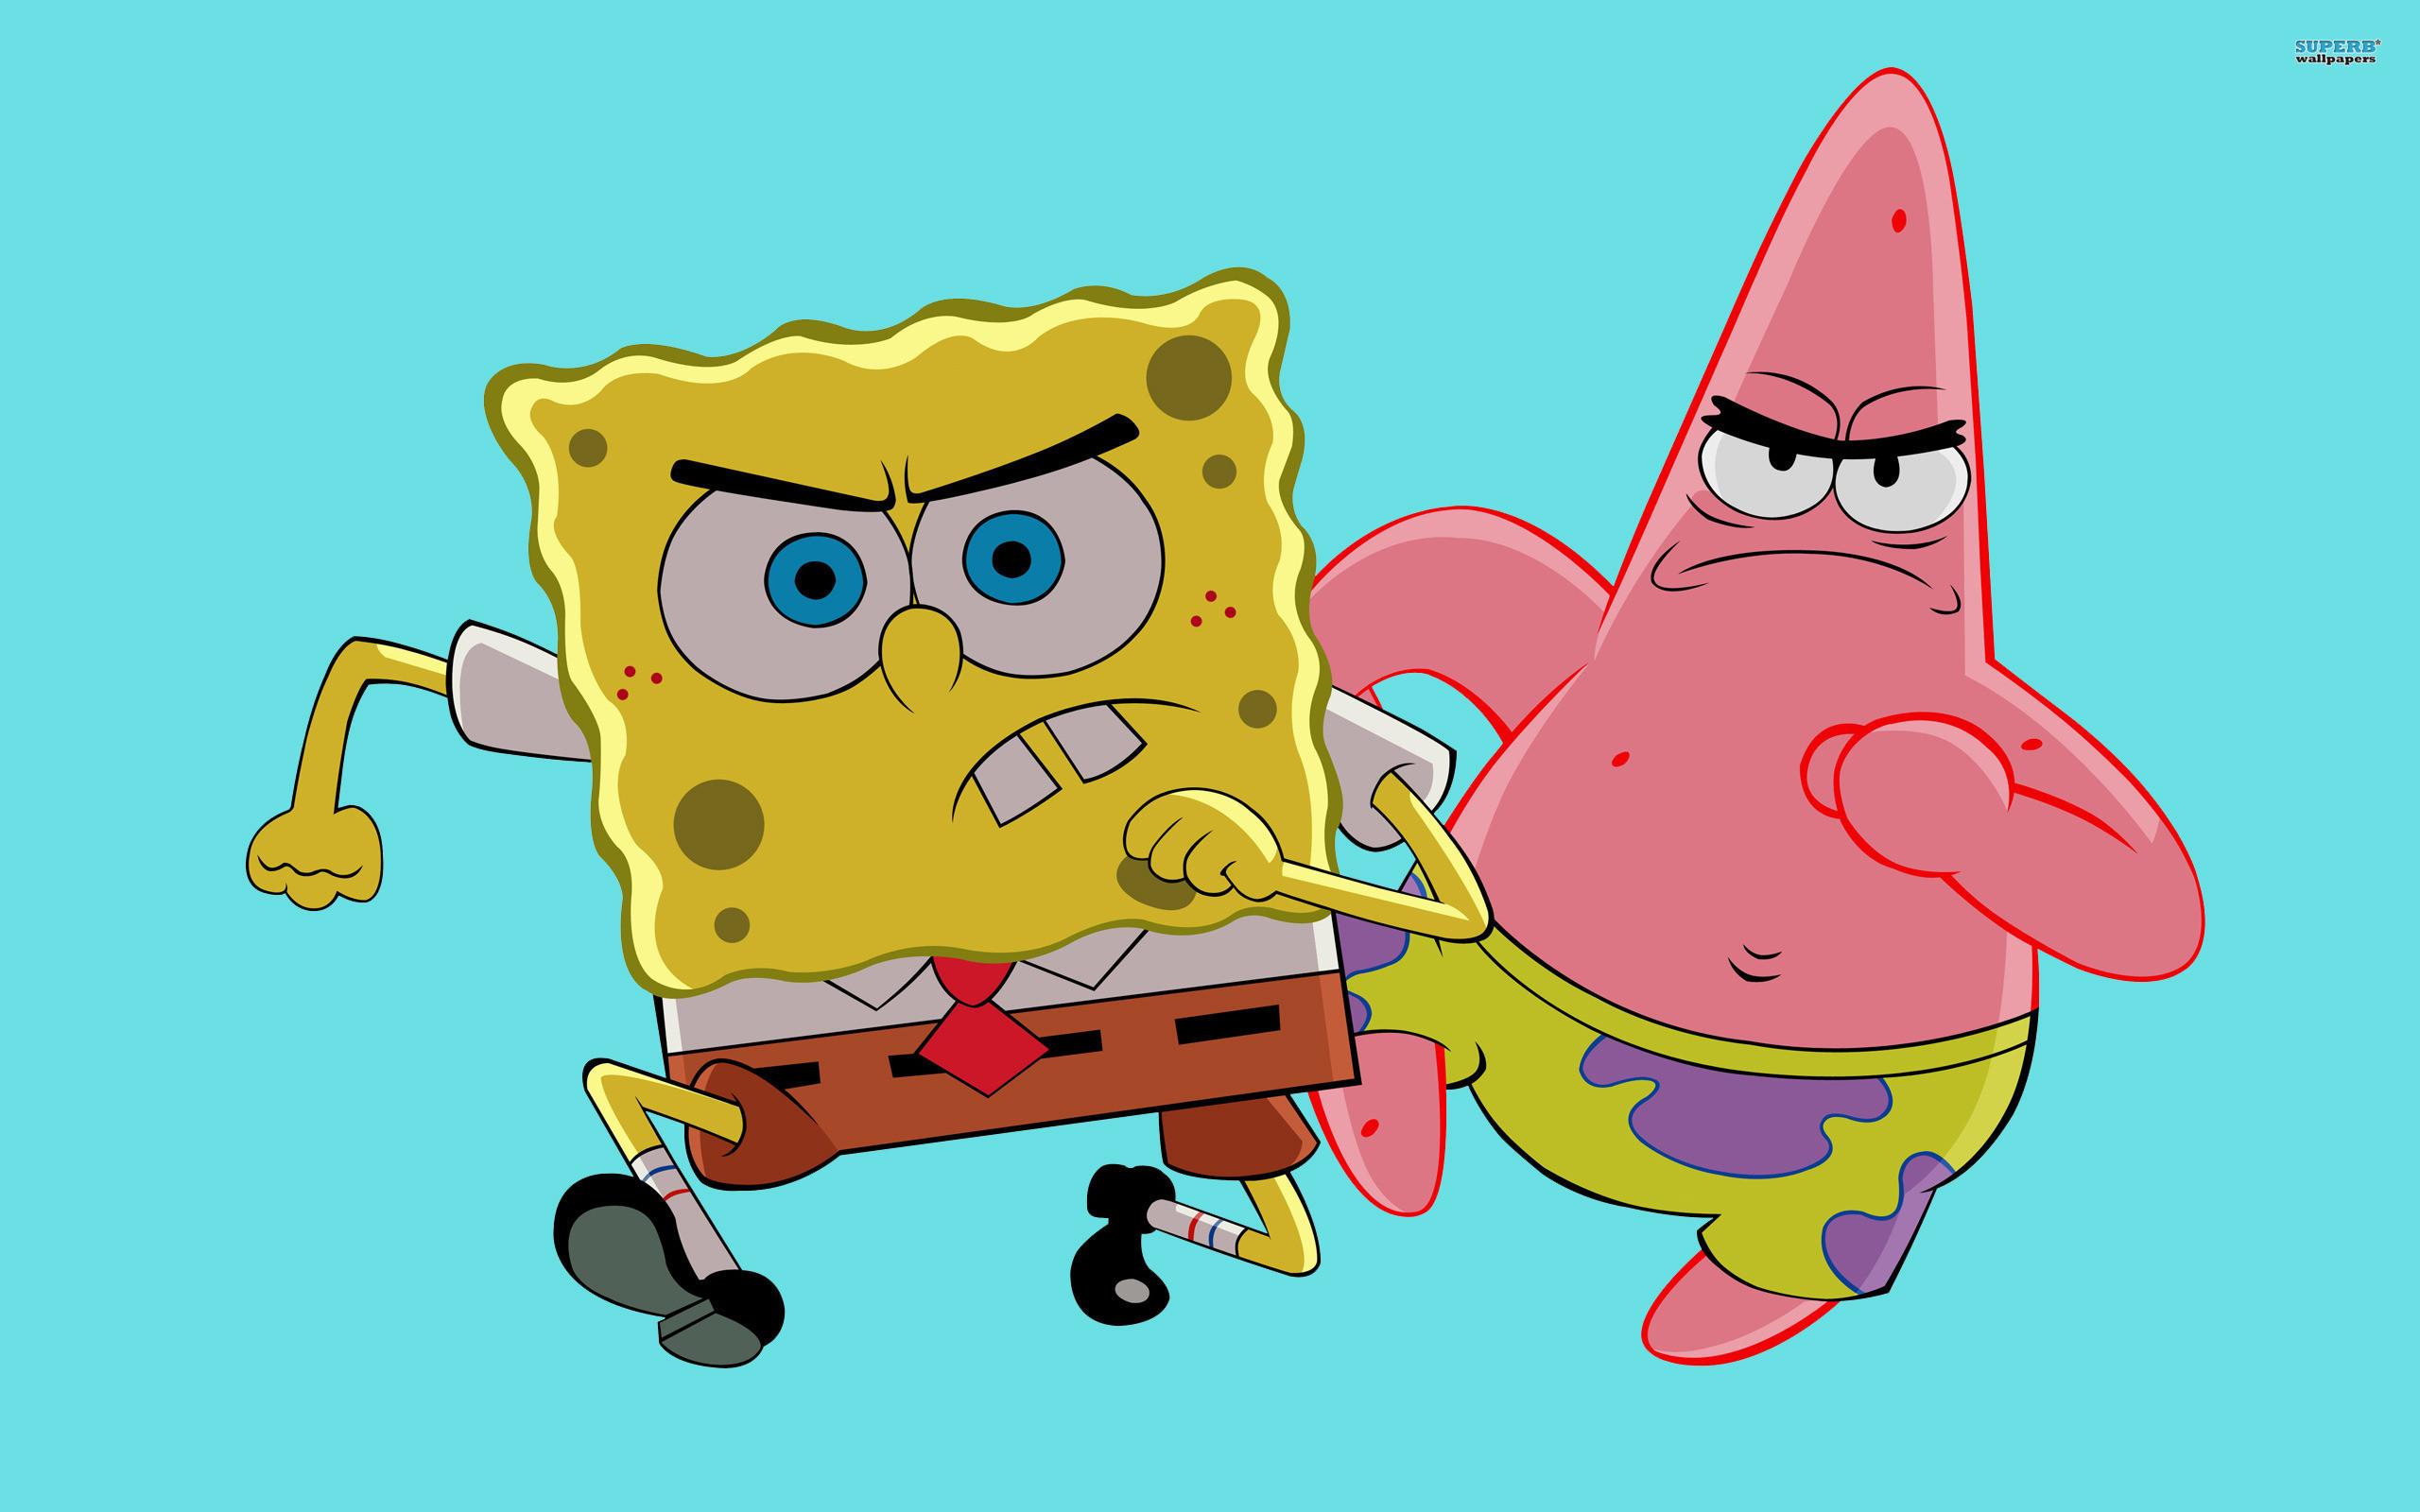 Spongebob Patrick Wallpaper Squarepants Pictures 19180station.jpg